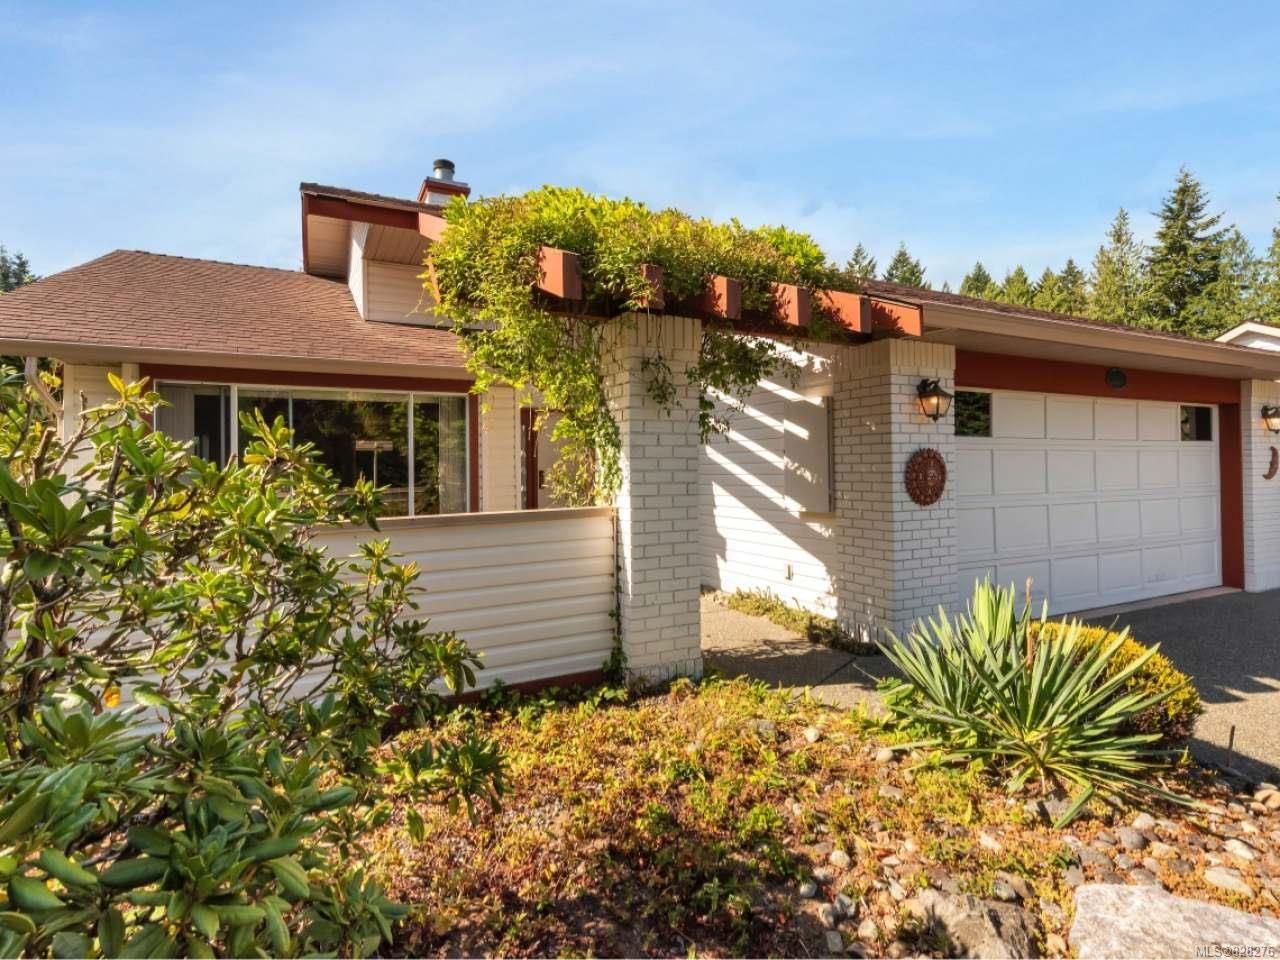 Main Photo: 622 Pine Ridge Crt in COBBLE HILL: ML Cobble Hill House for sale (Malahat & Area)  : MLS®# 828276